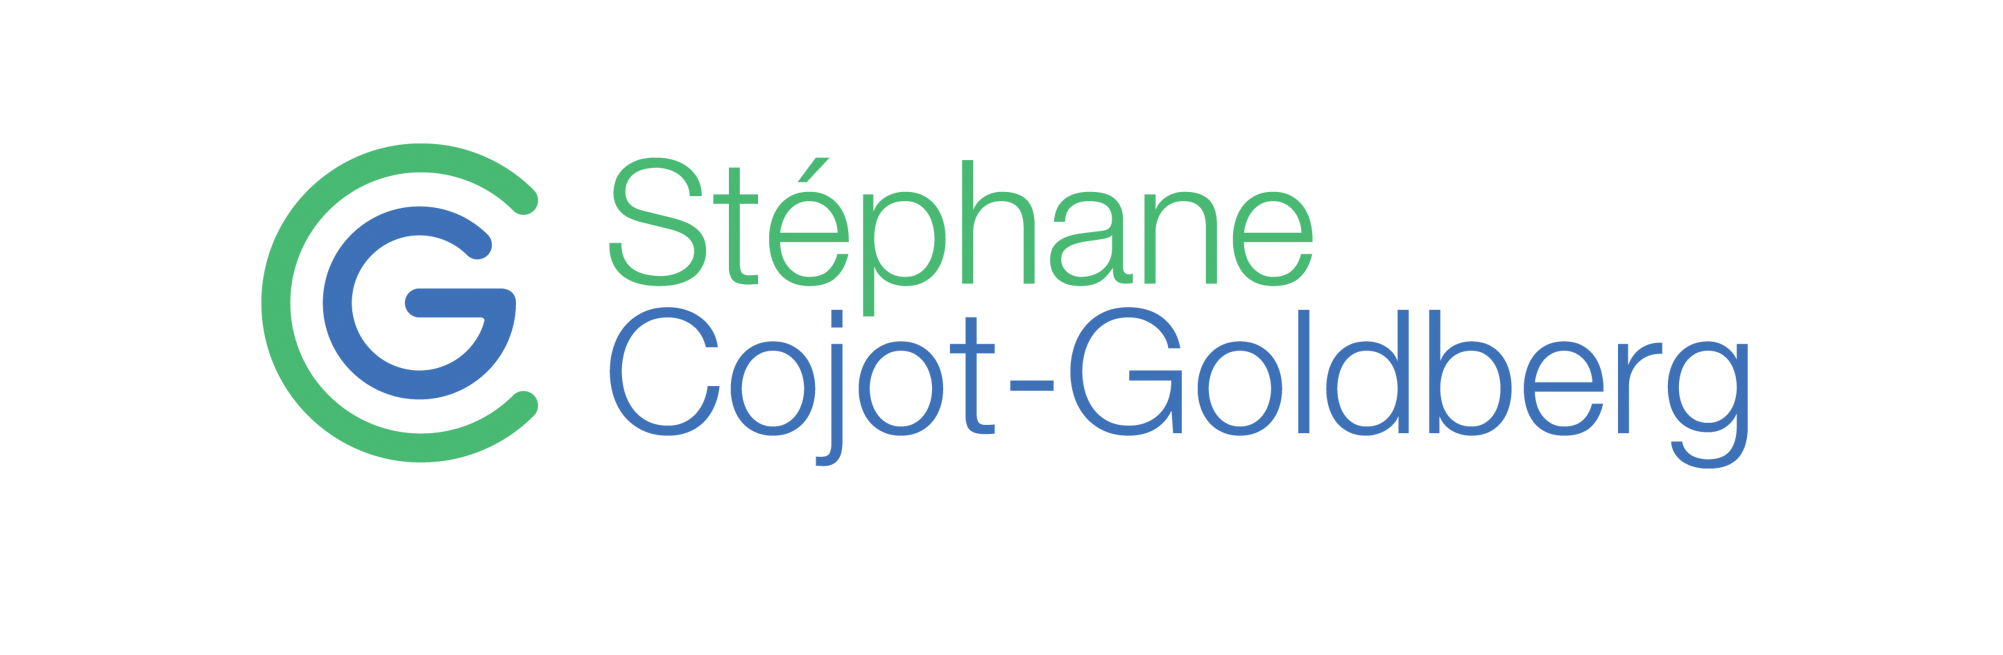 Stéphane Cojot-Goldberg